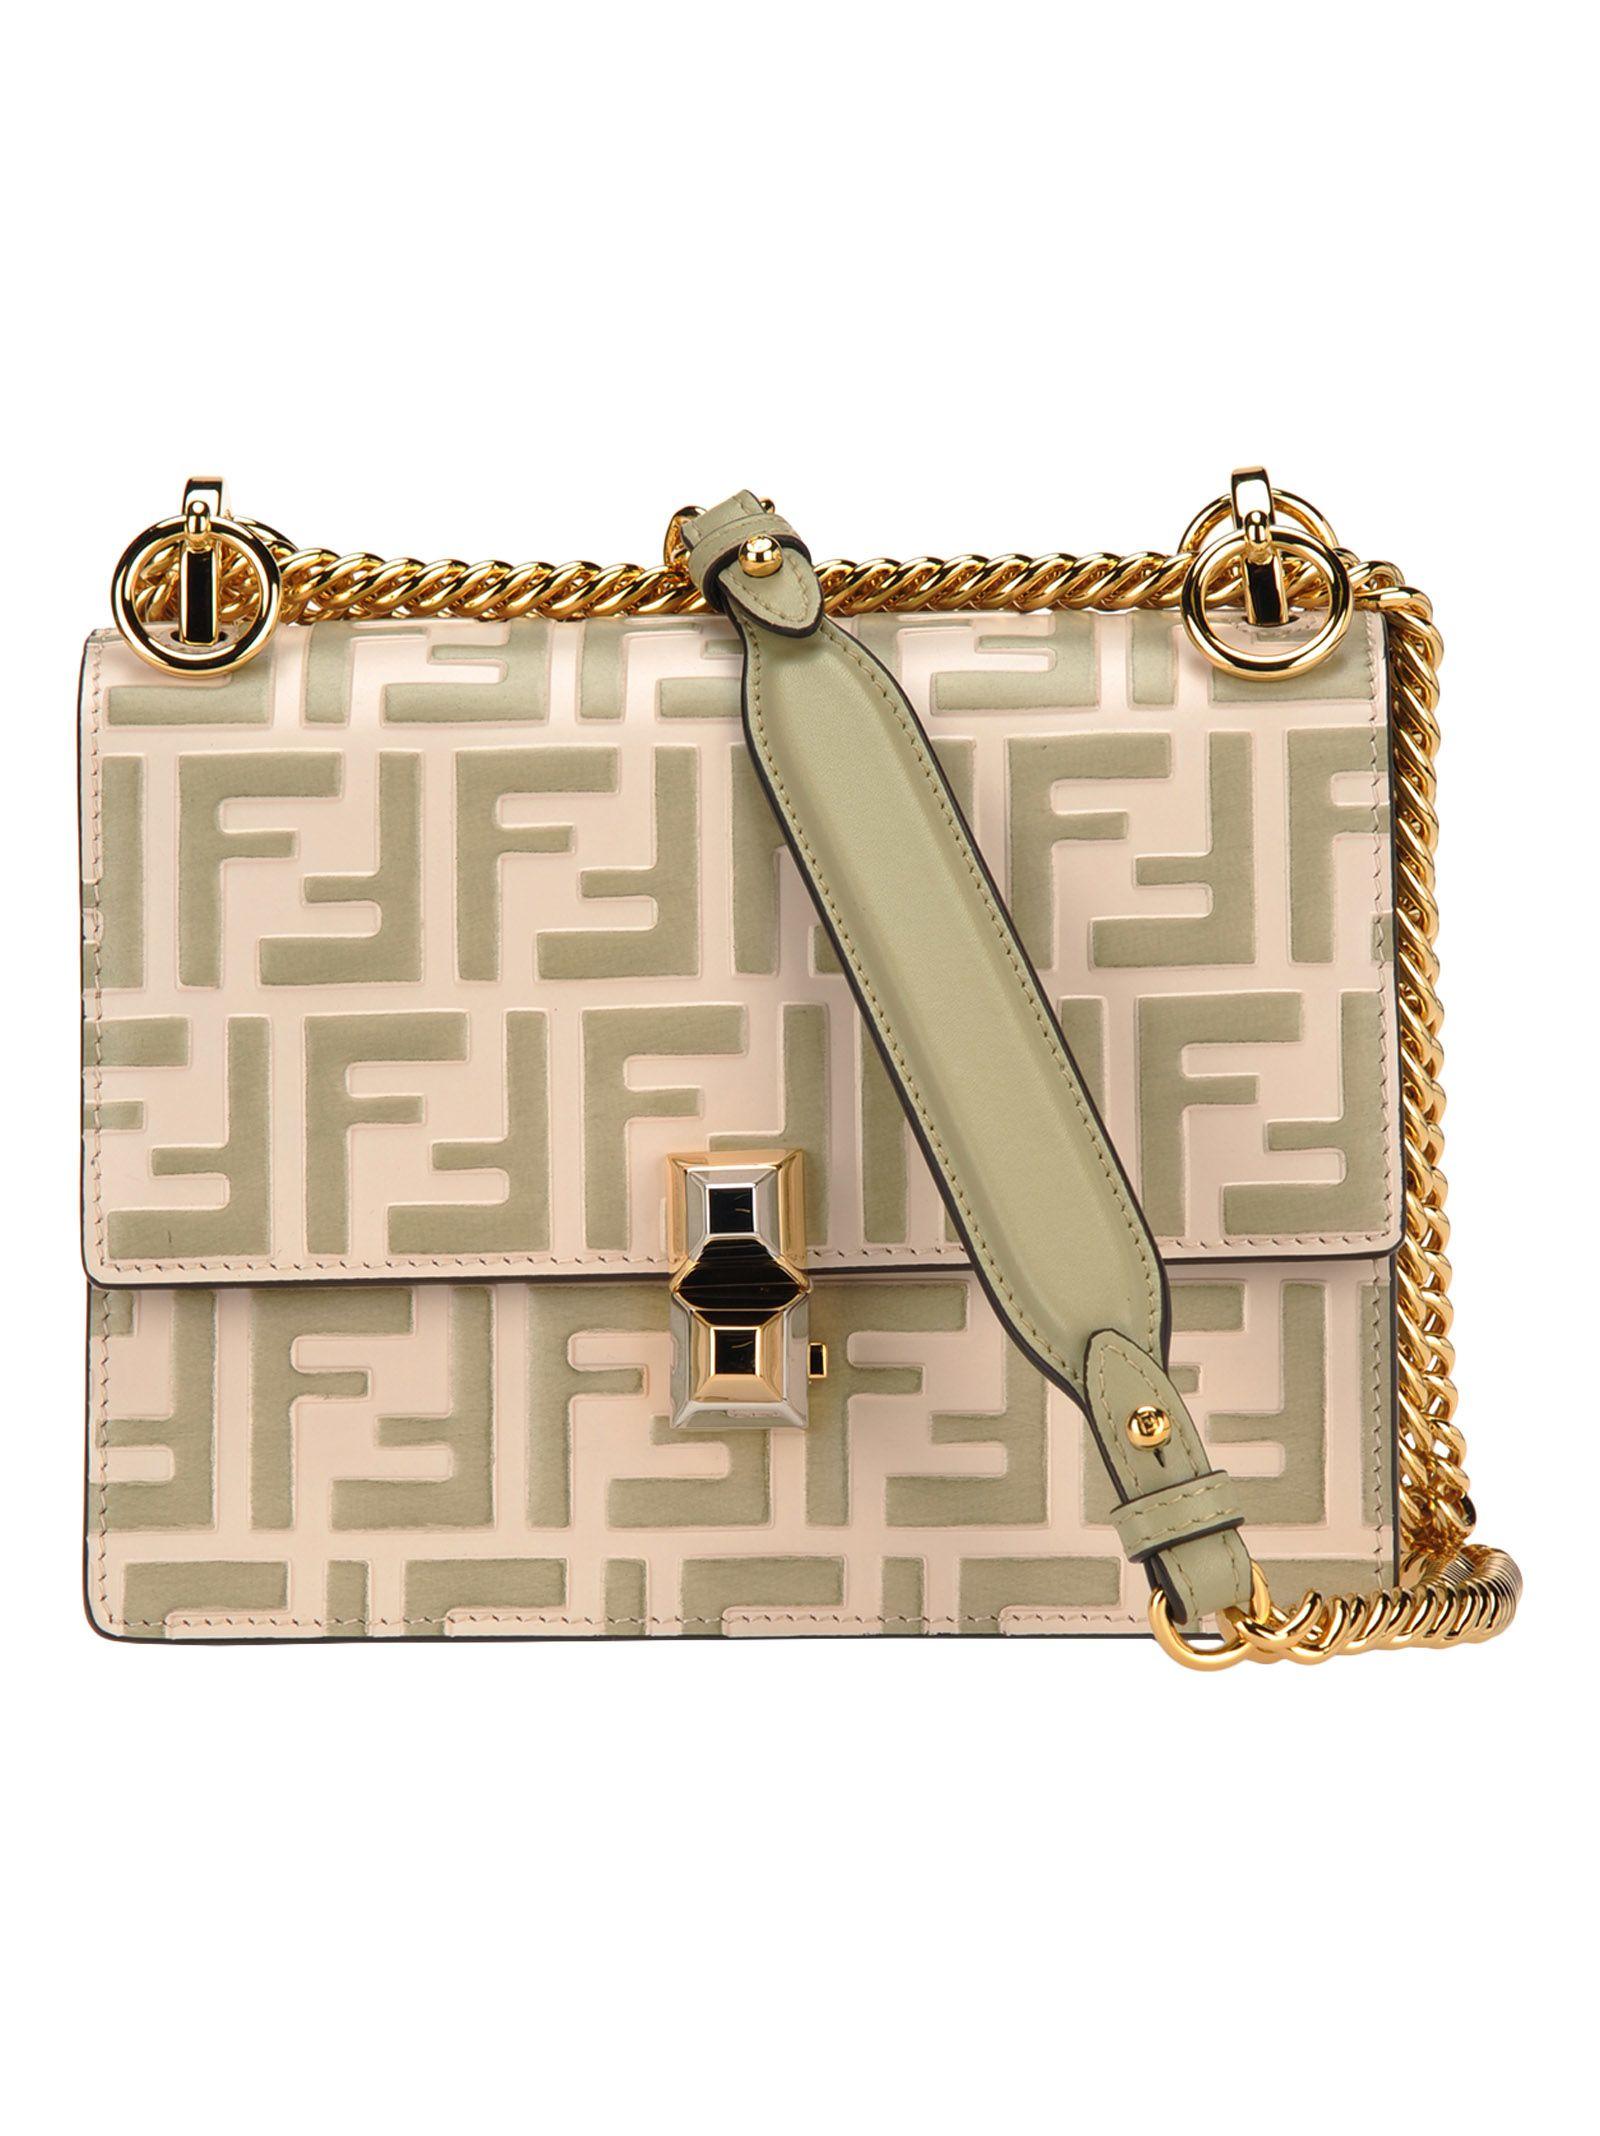 762bdcbfd6 Fendi Fendi Kan I Small Shoulder Bag - Basic - 10857770